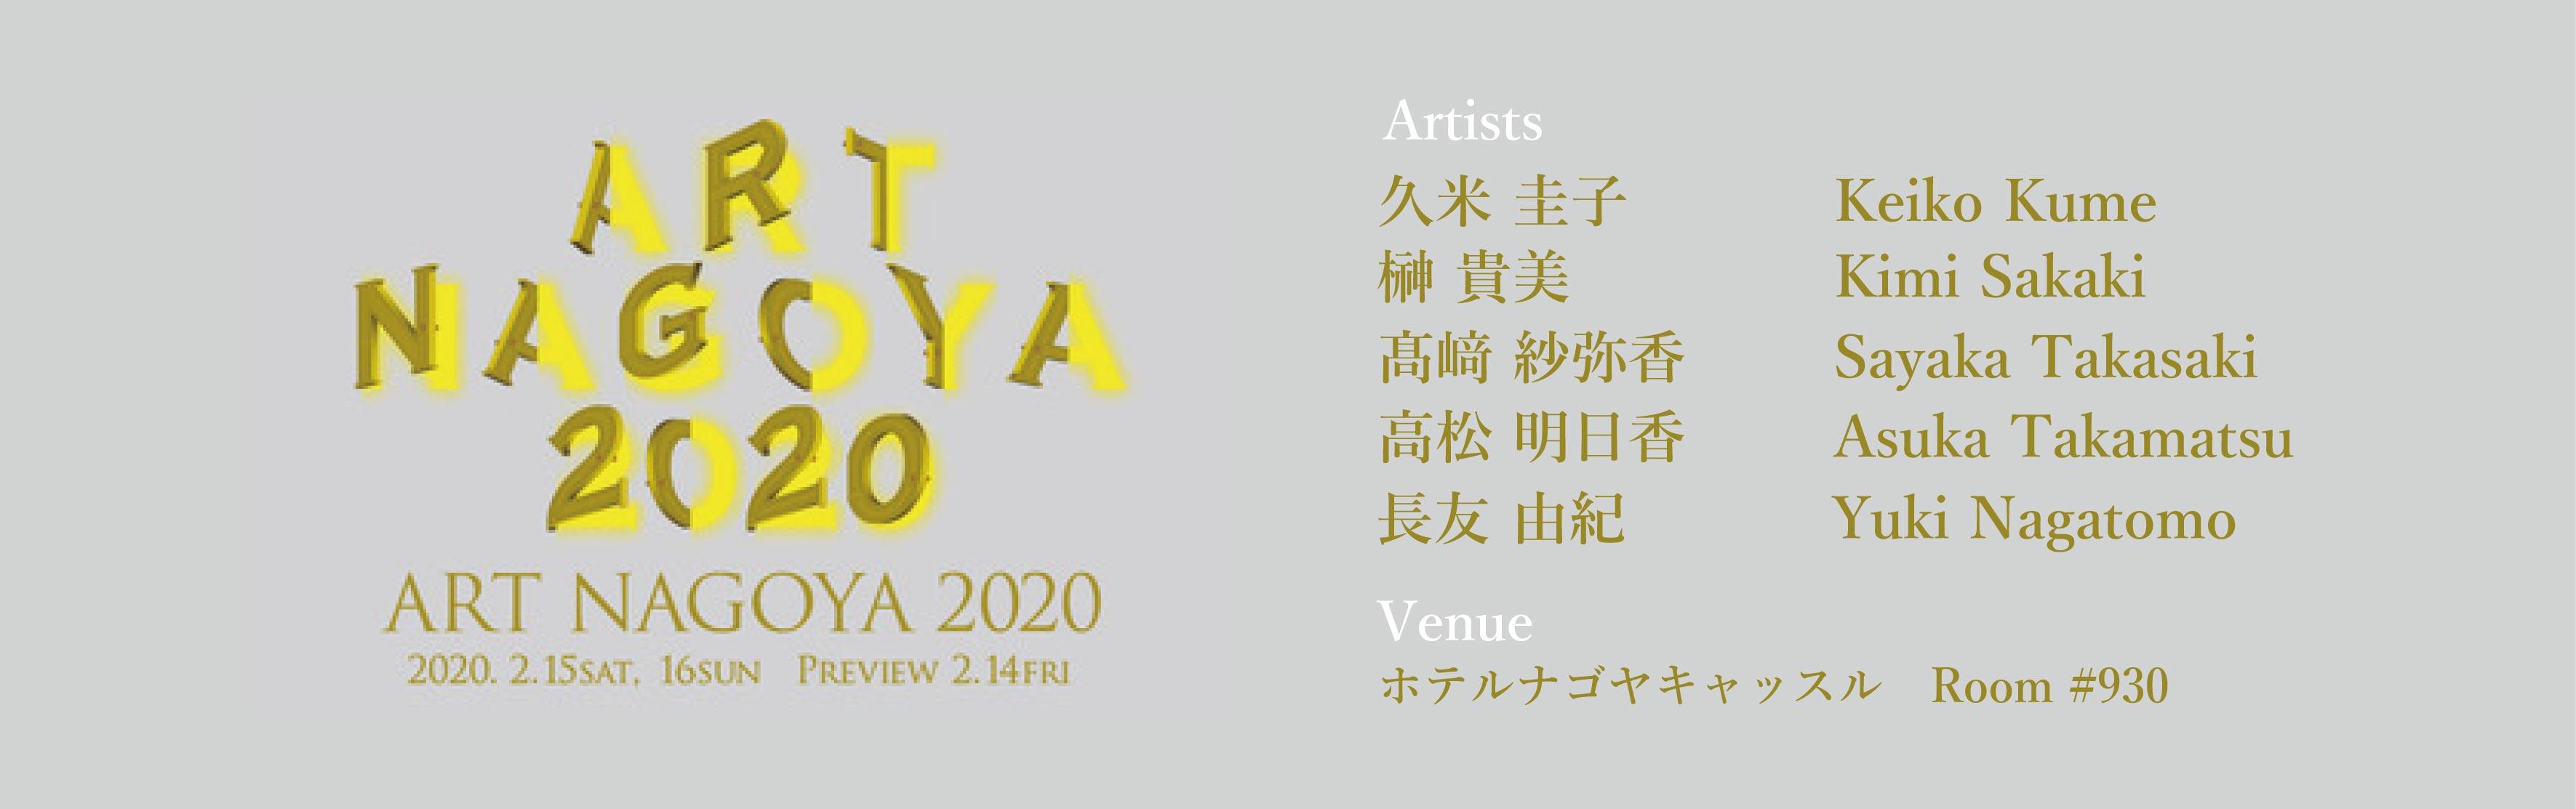 banner_artnagoya_jpn